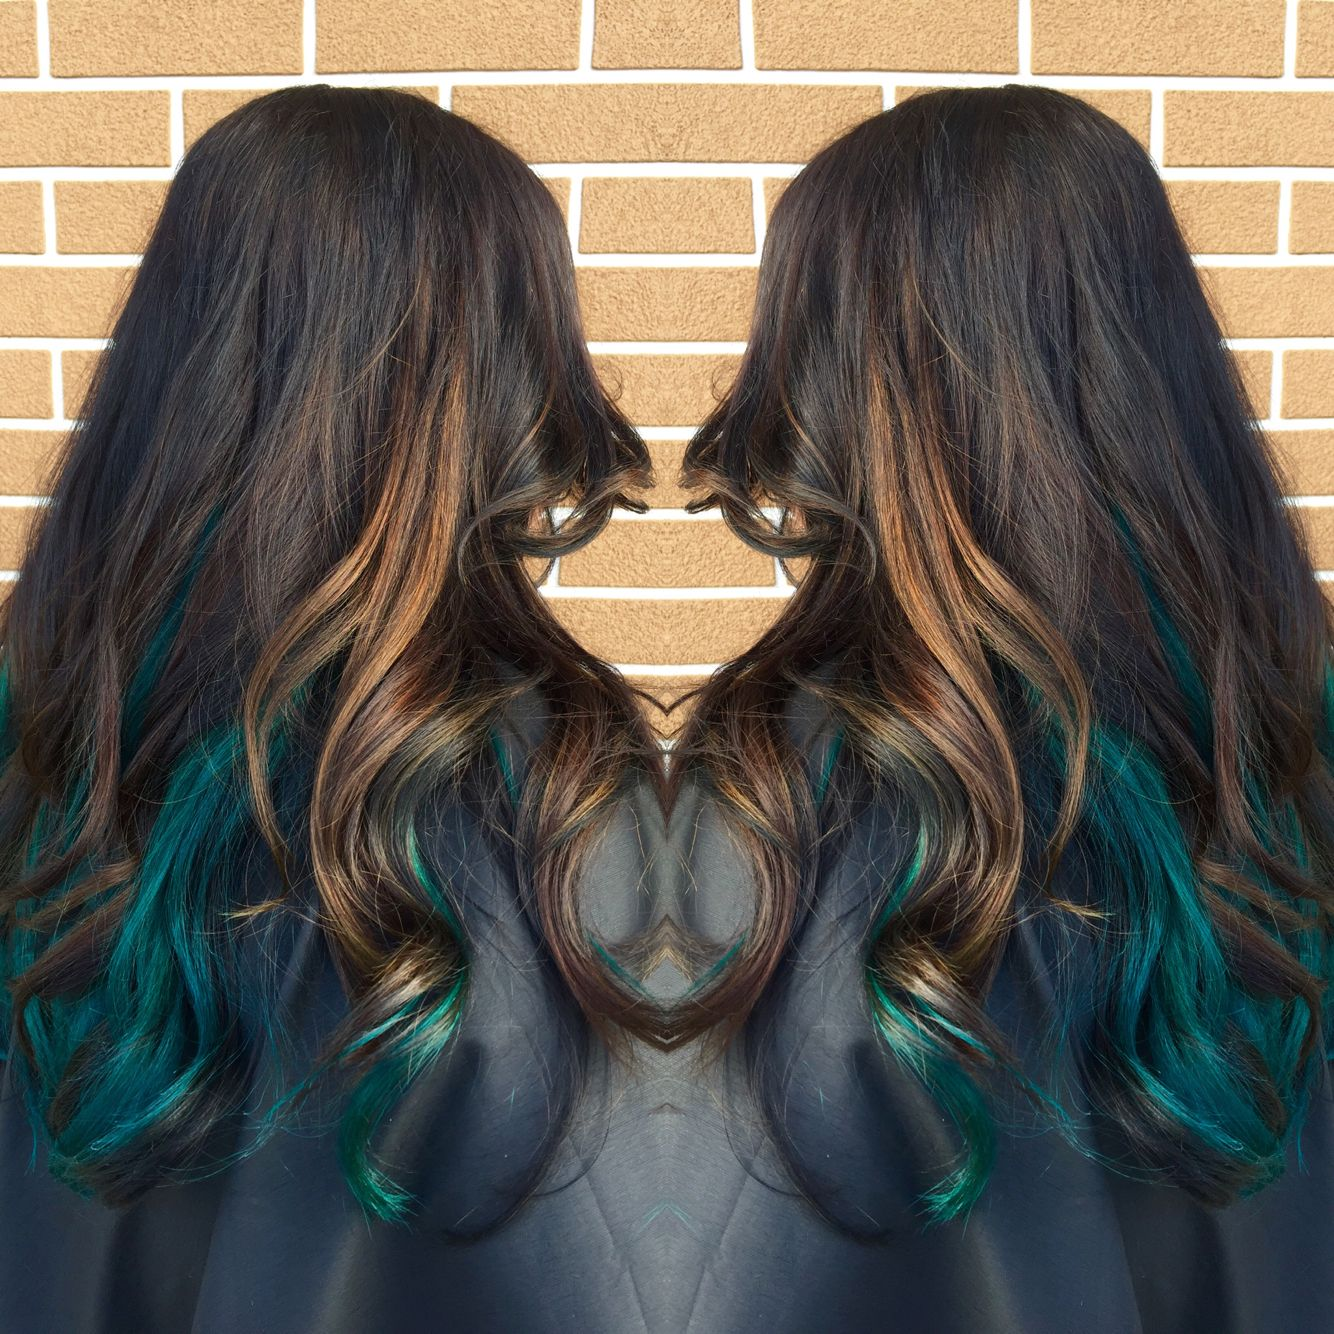 Teal Hair Teal Peekaboo Pravana Green Blue Balayage